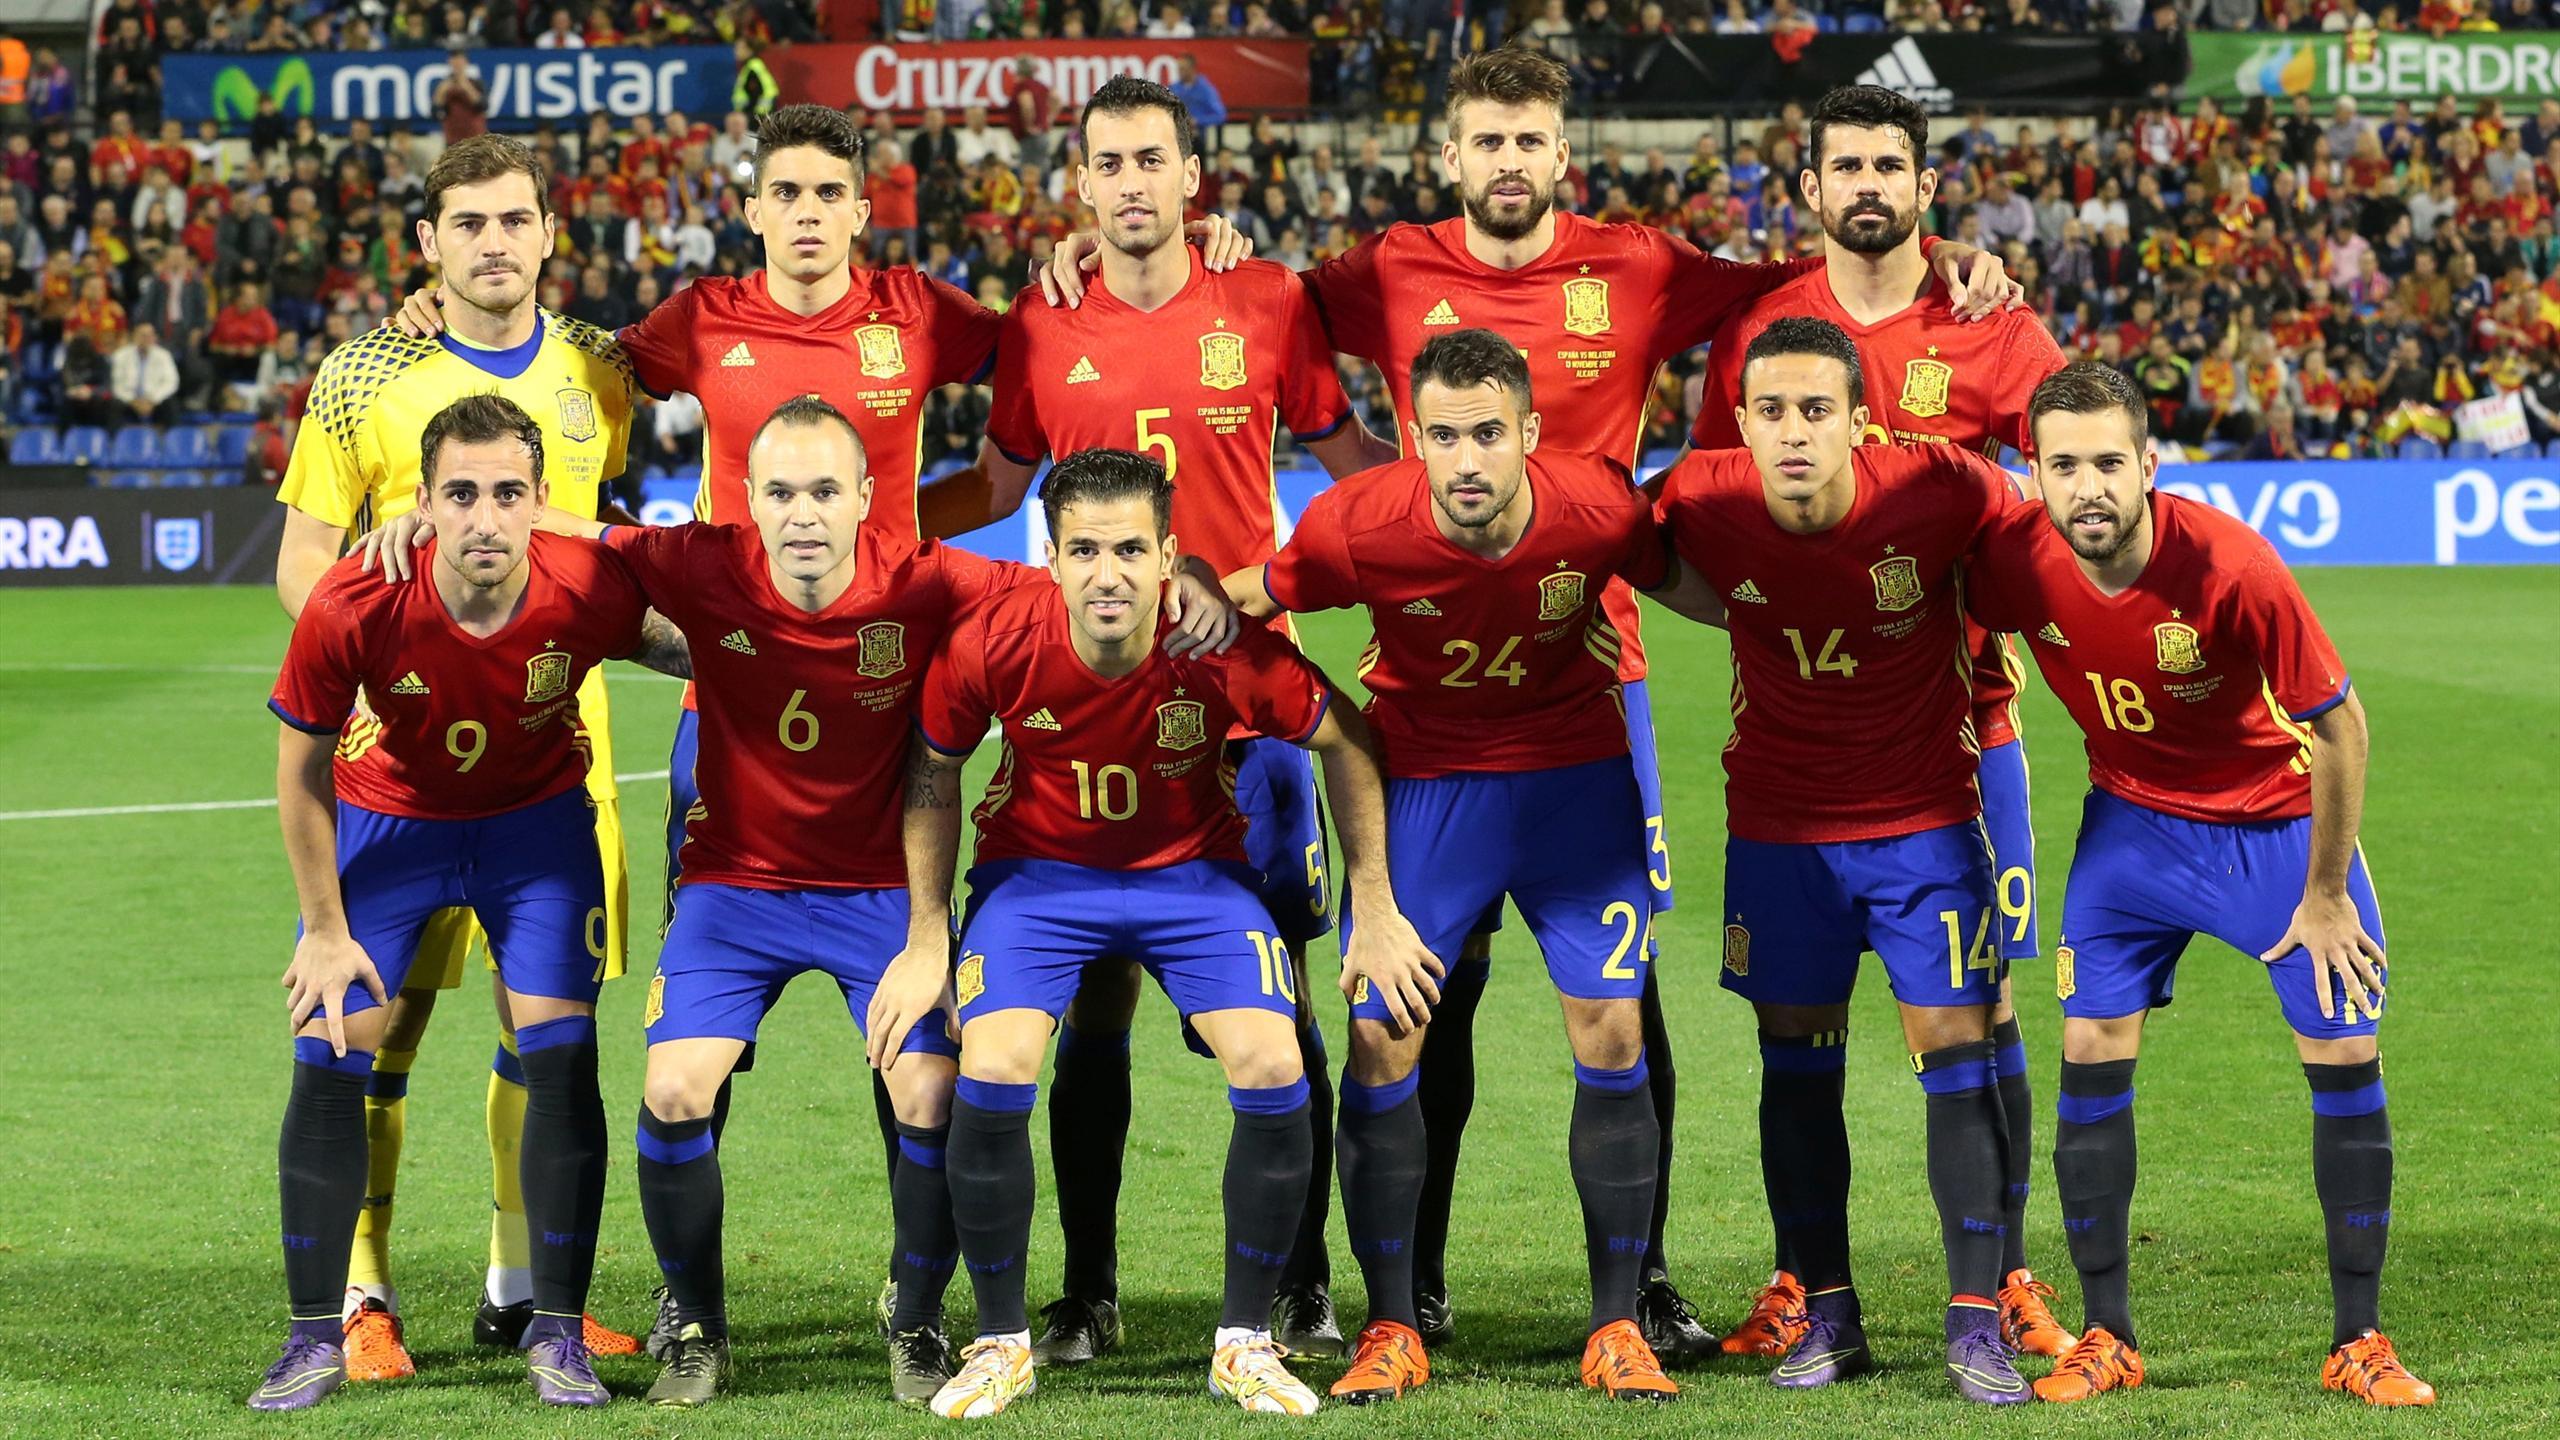 Spanische Nationalmanschaft